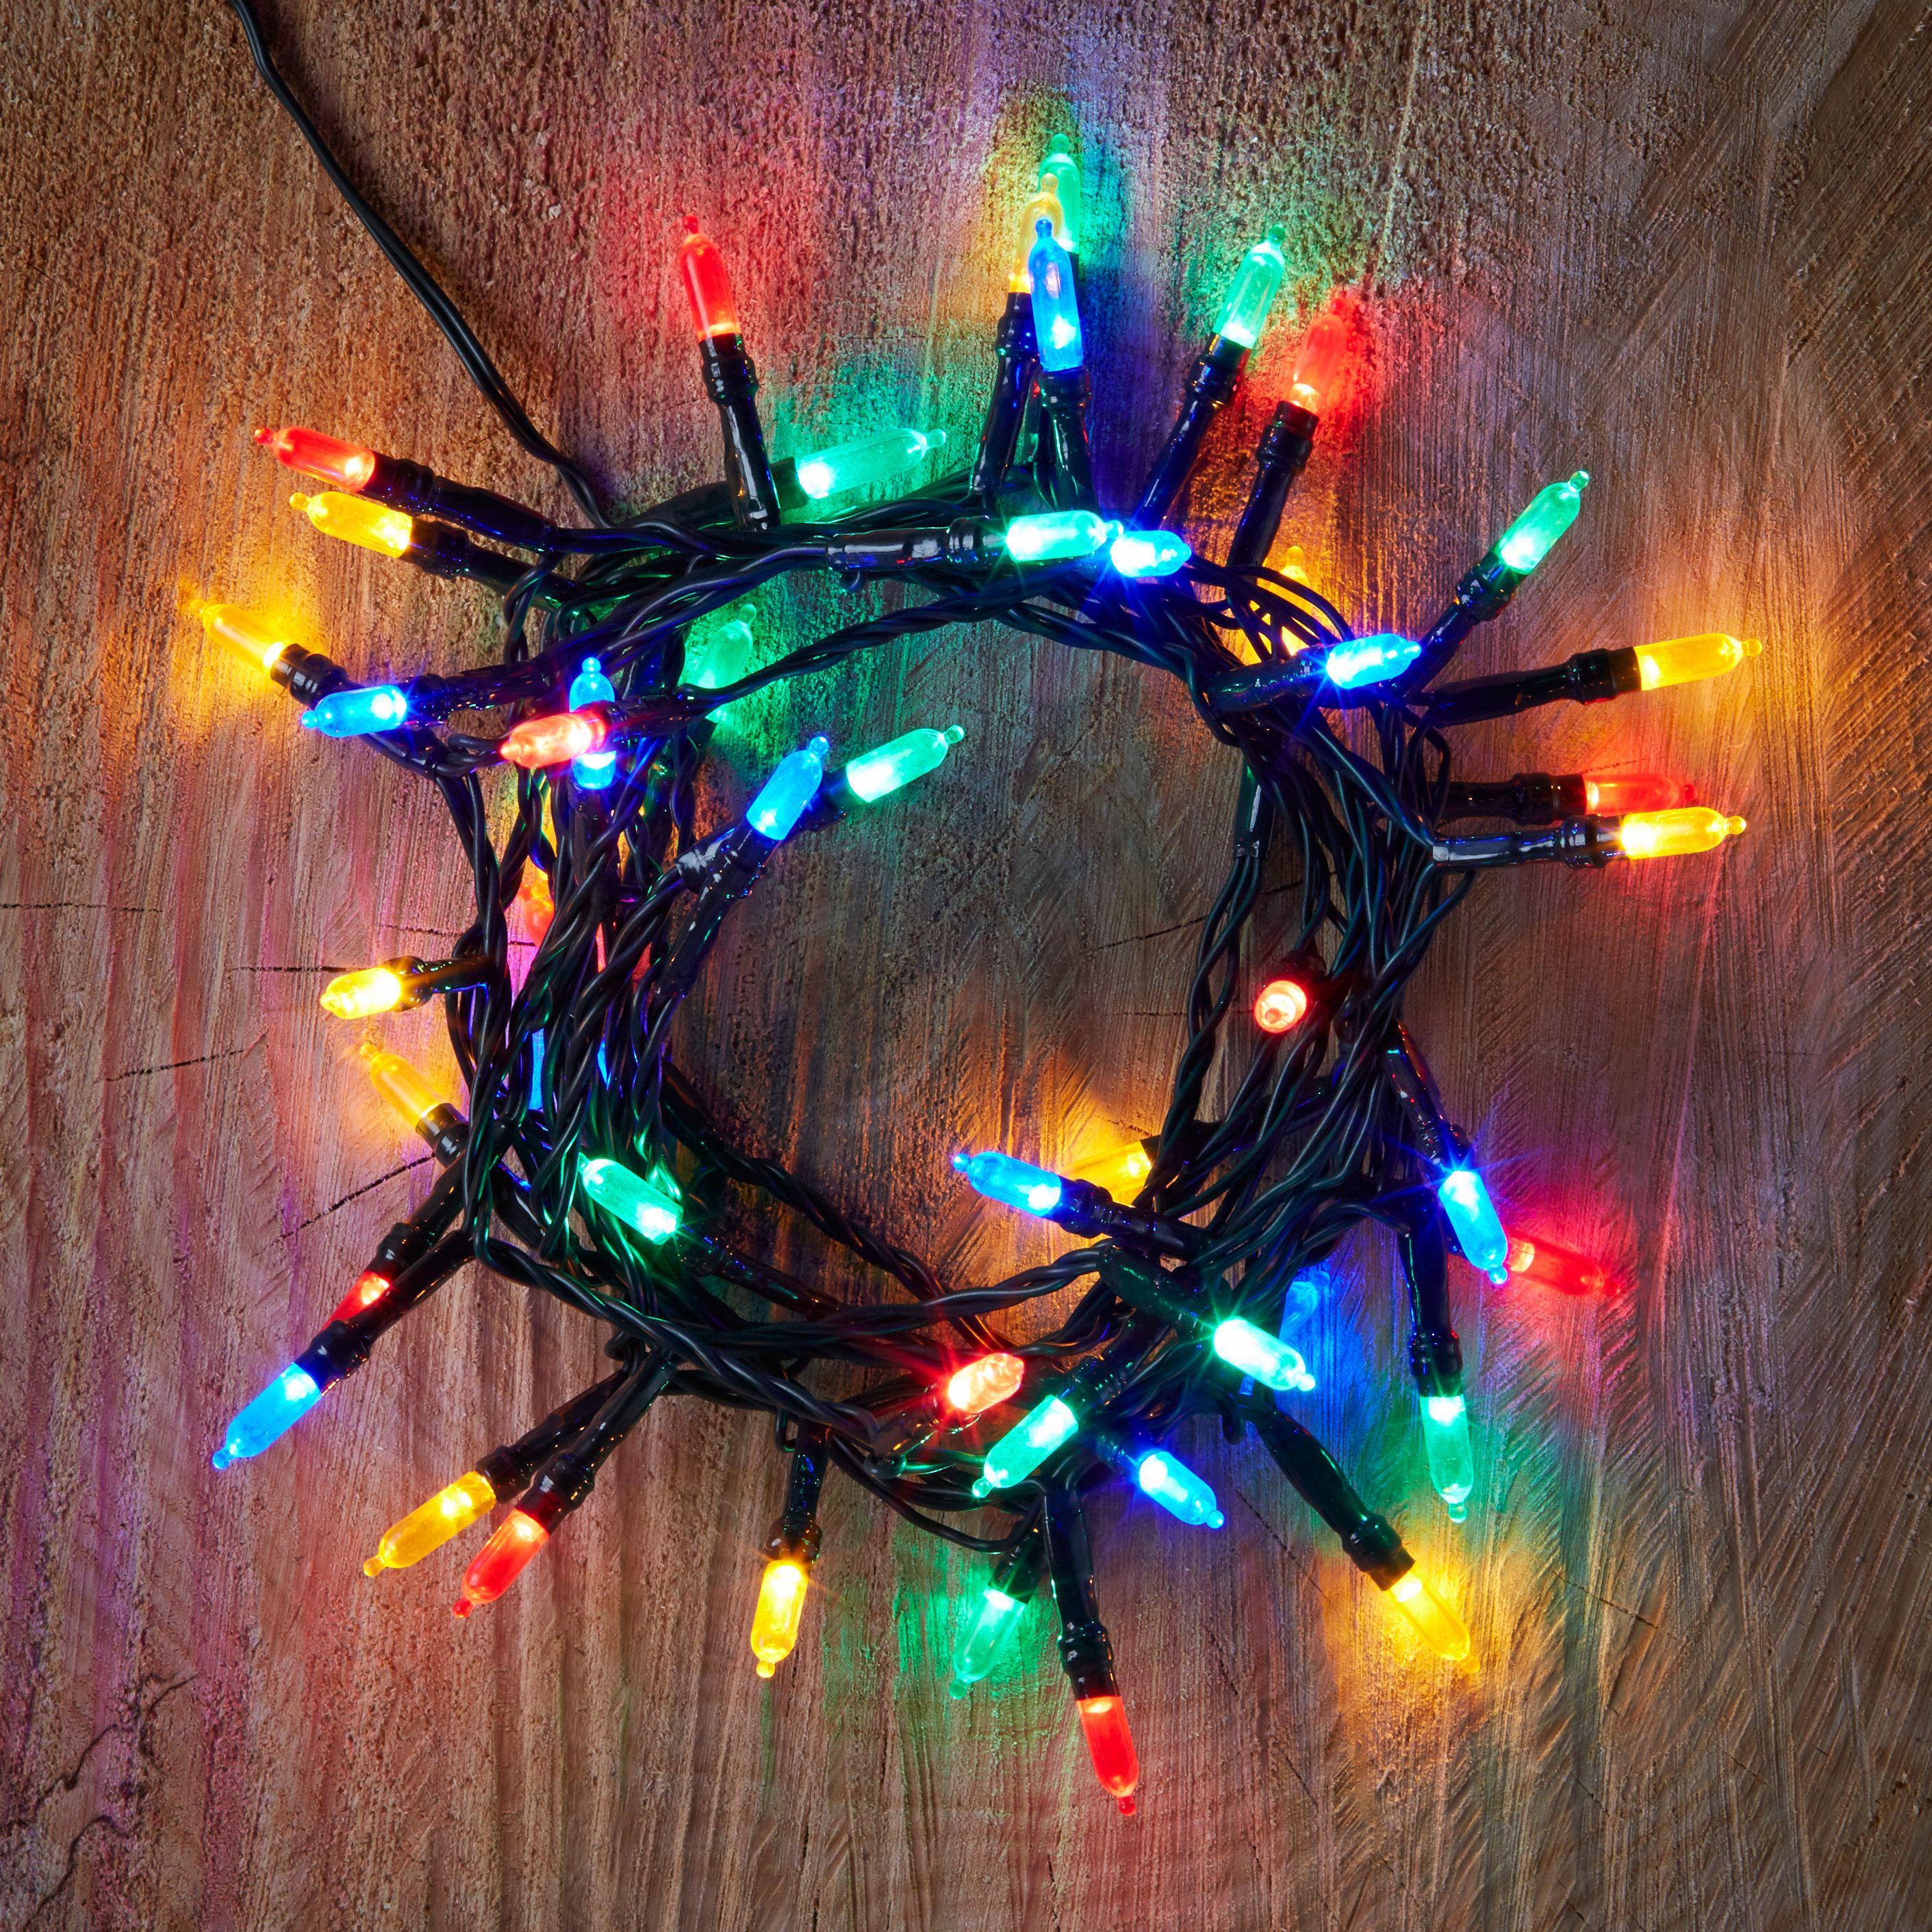 String Lights B And Q : 50 Multicolour LED String Lights Departments DIY at B&Q